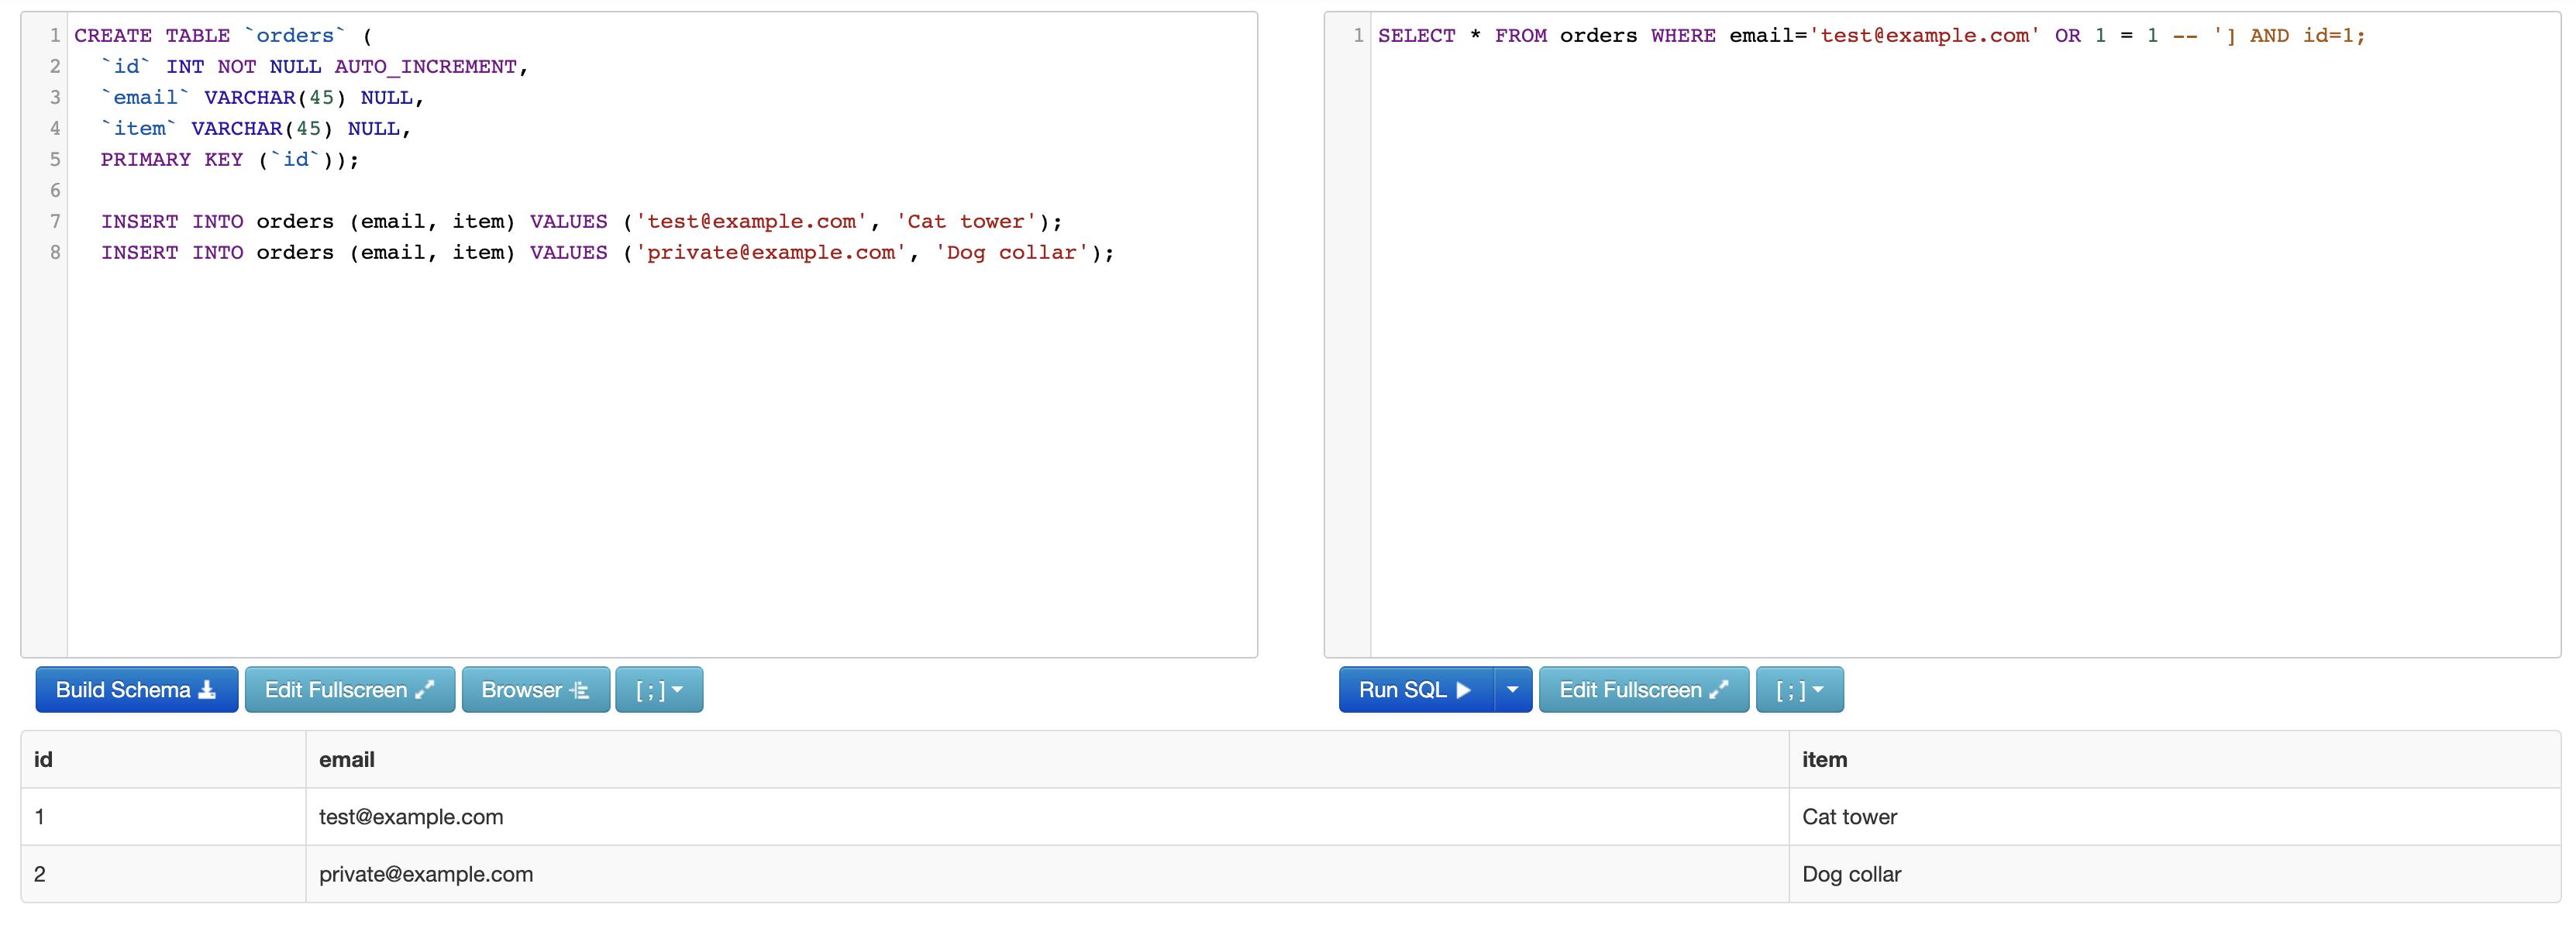 Malicious SQL query